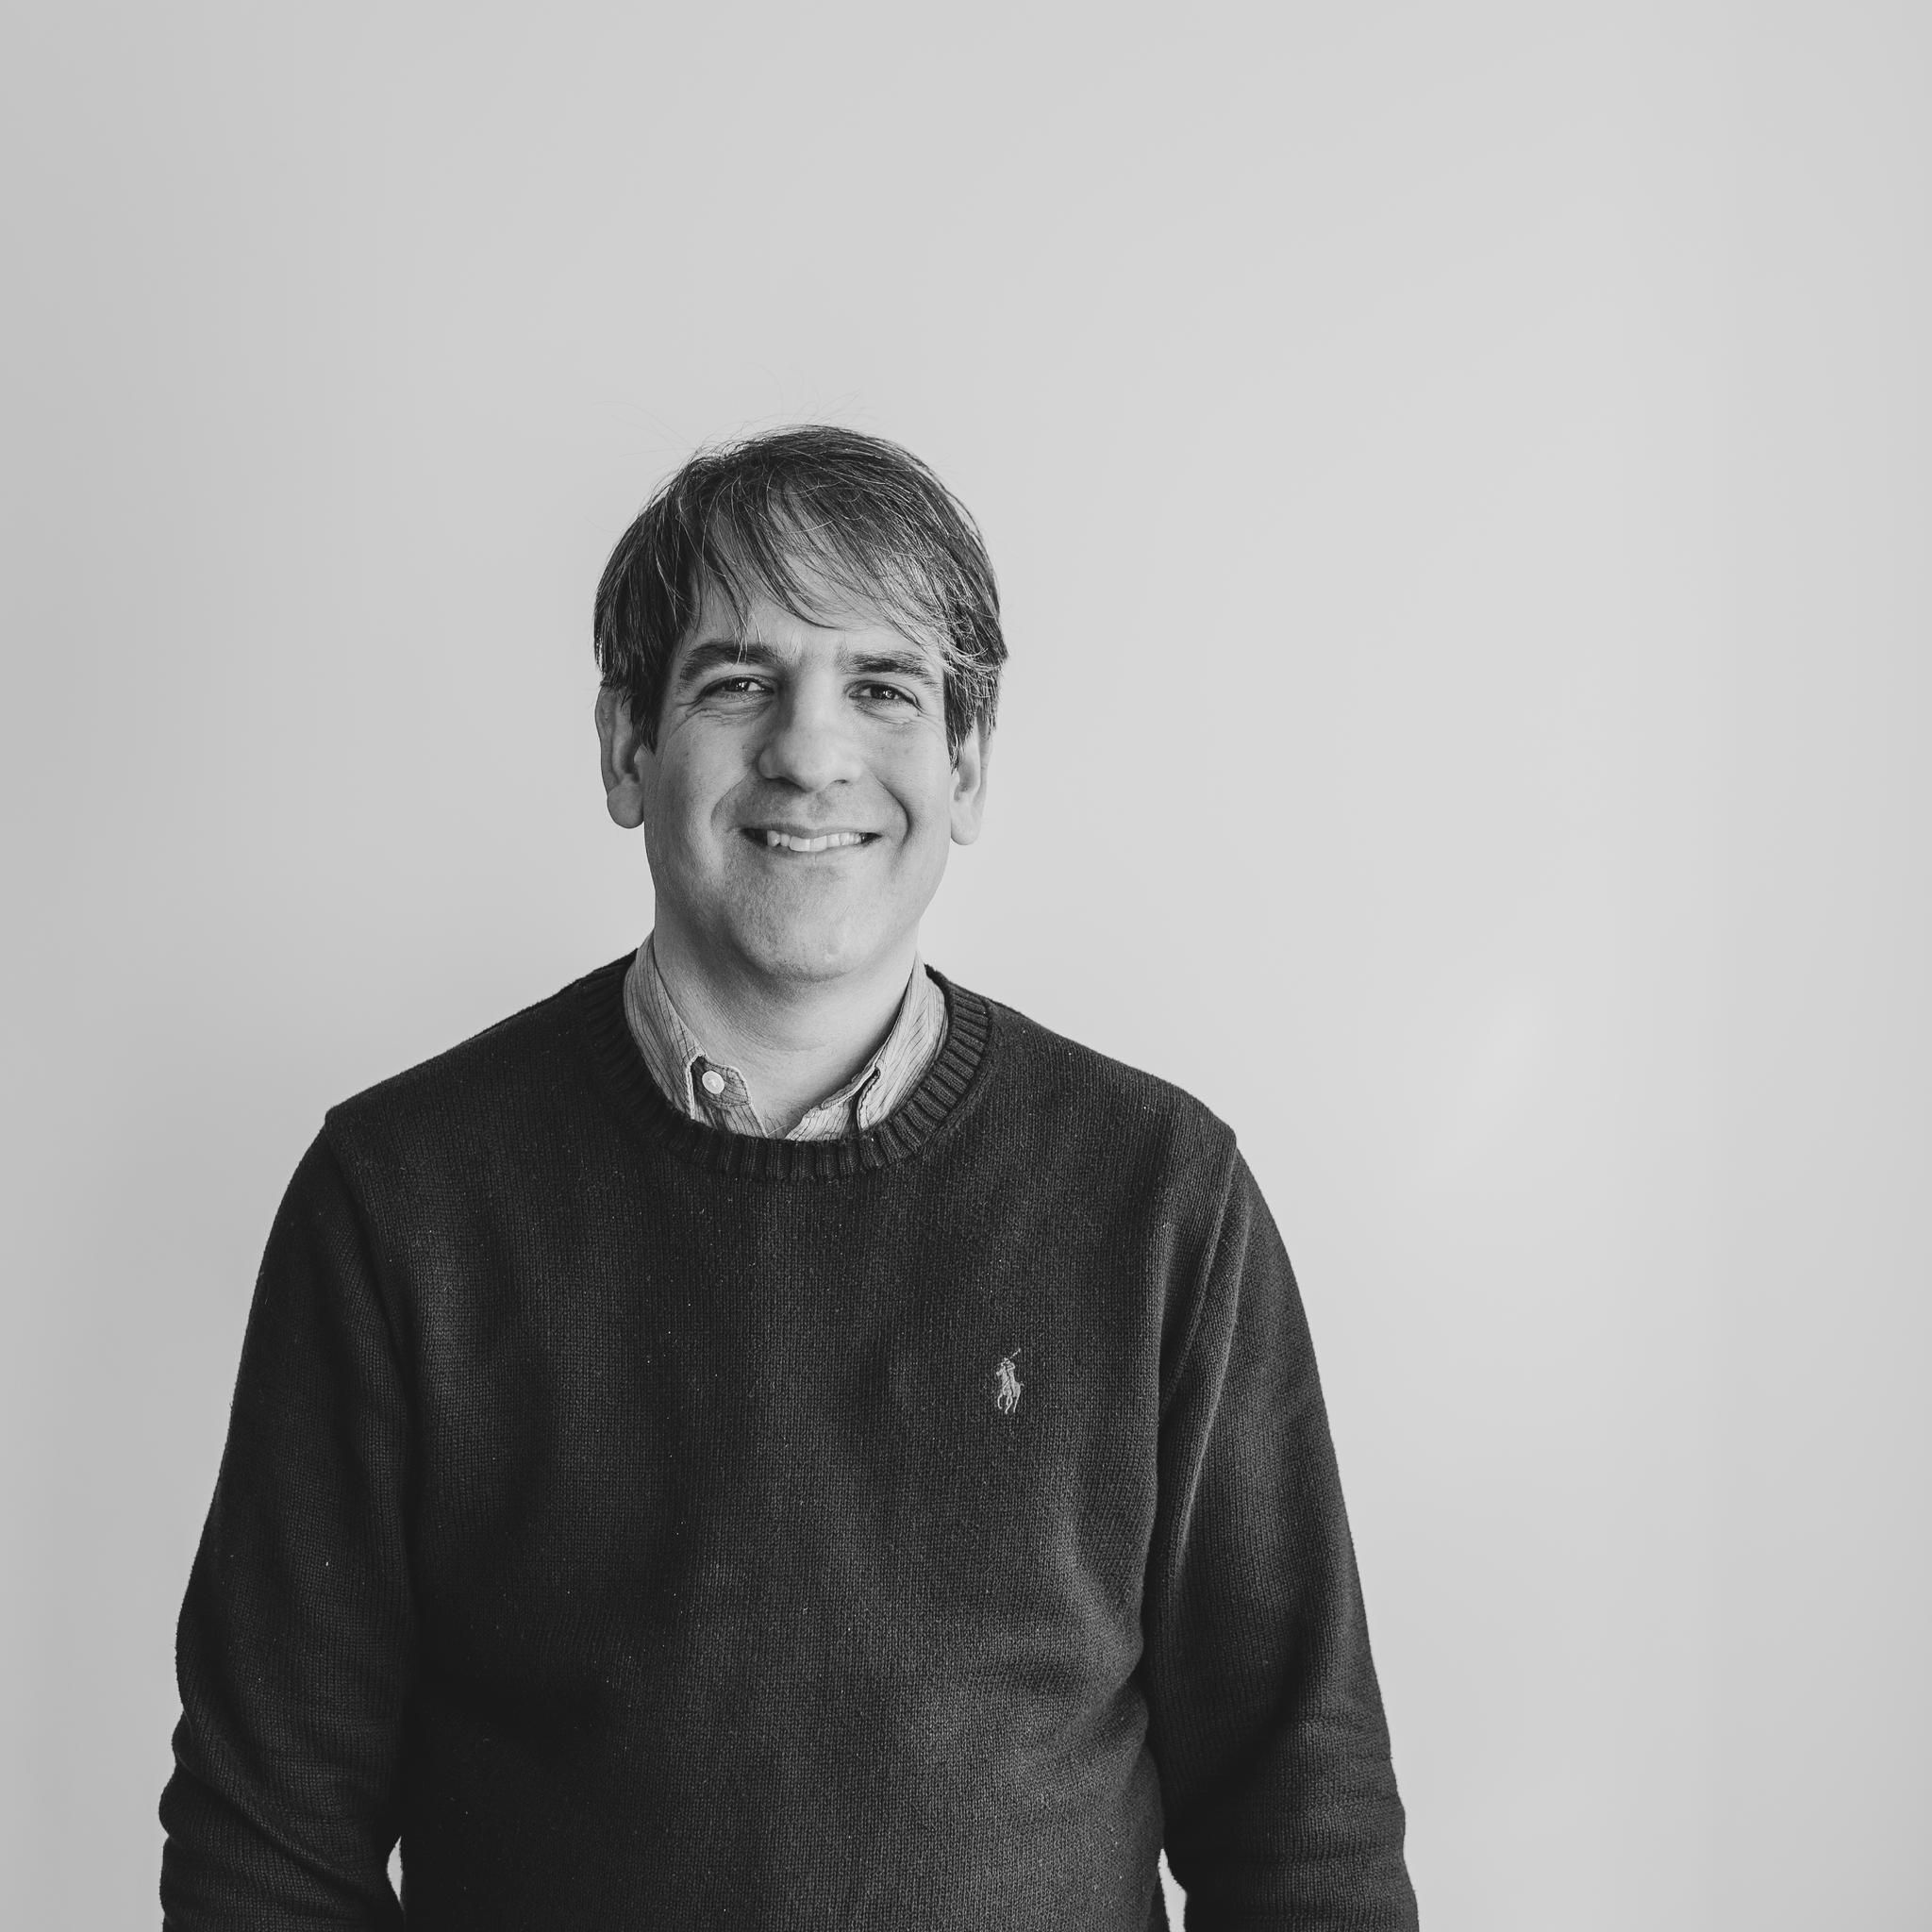 Giancarlo Pesiri